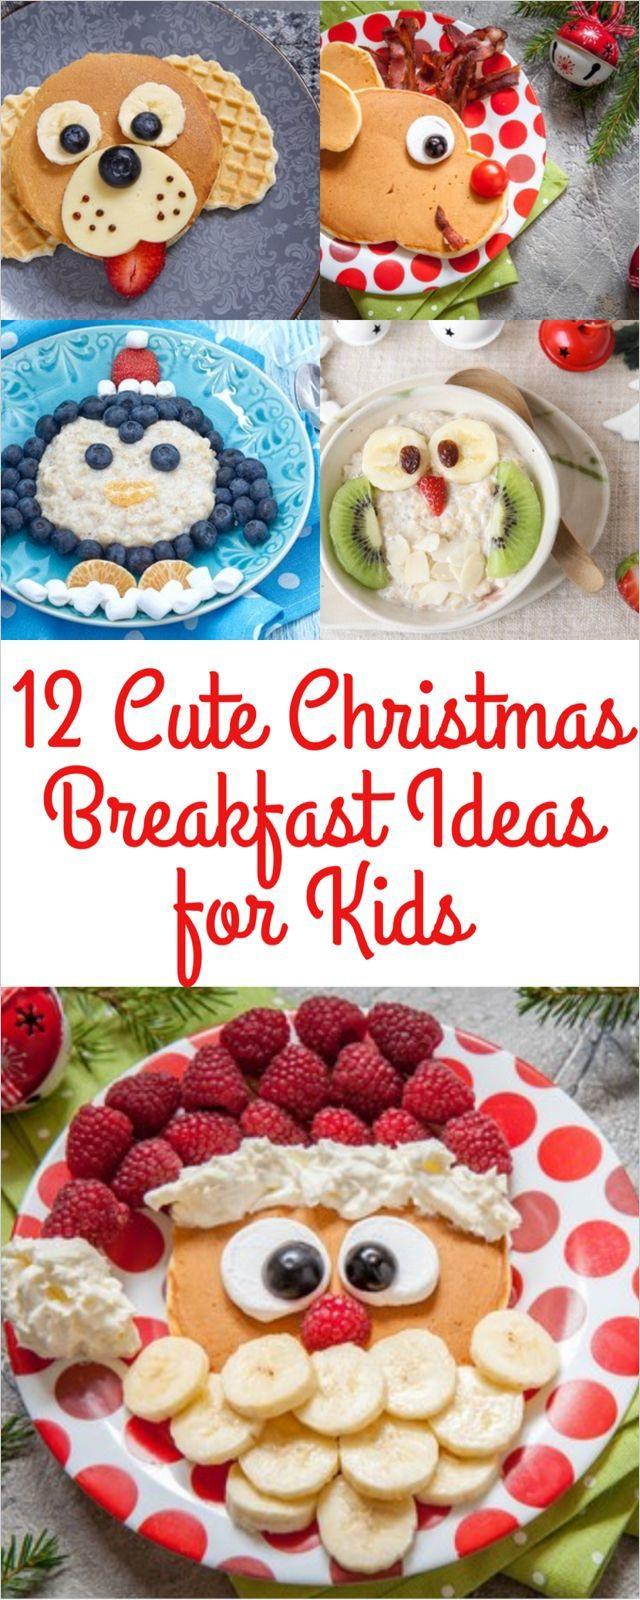 Christmas Breakfast Ideas For Kids  Best 25 Christmas fruit ideas ideas on Pinterest